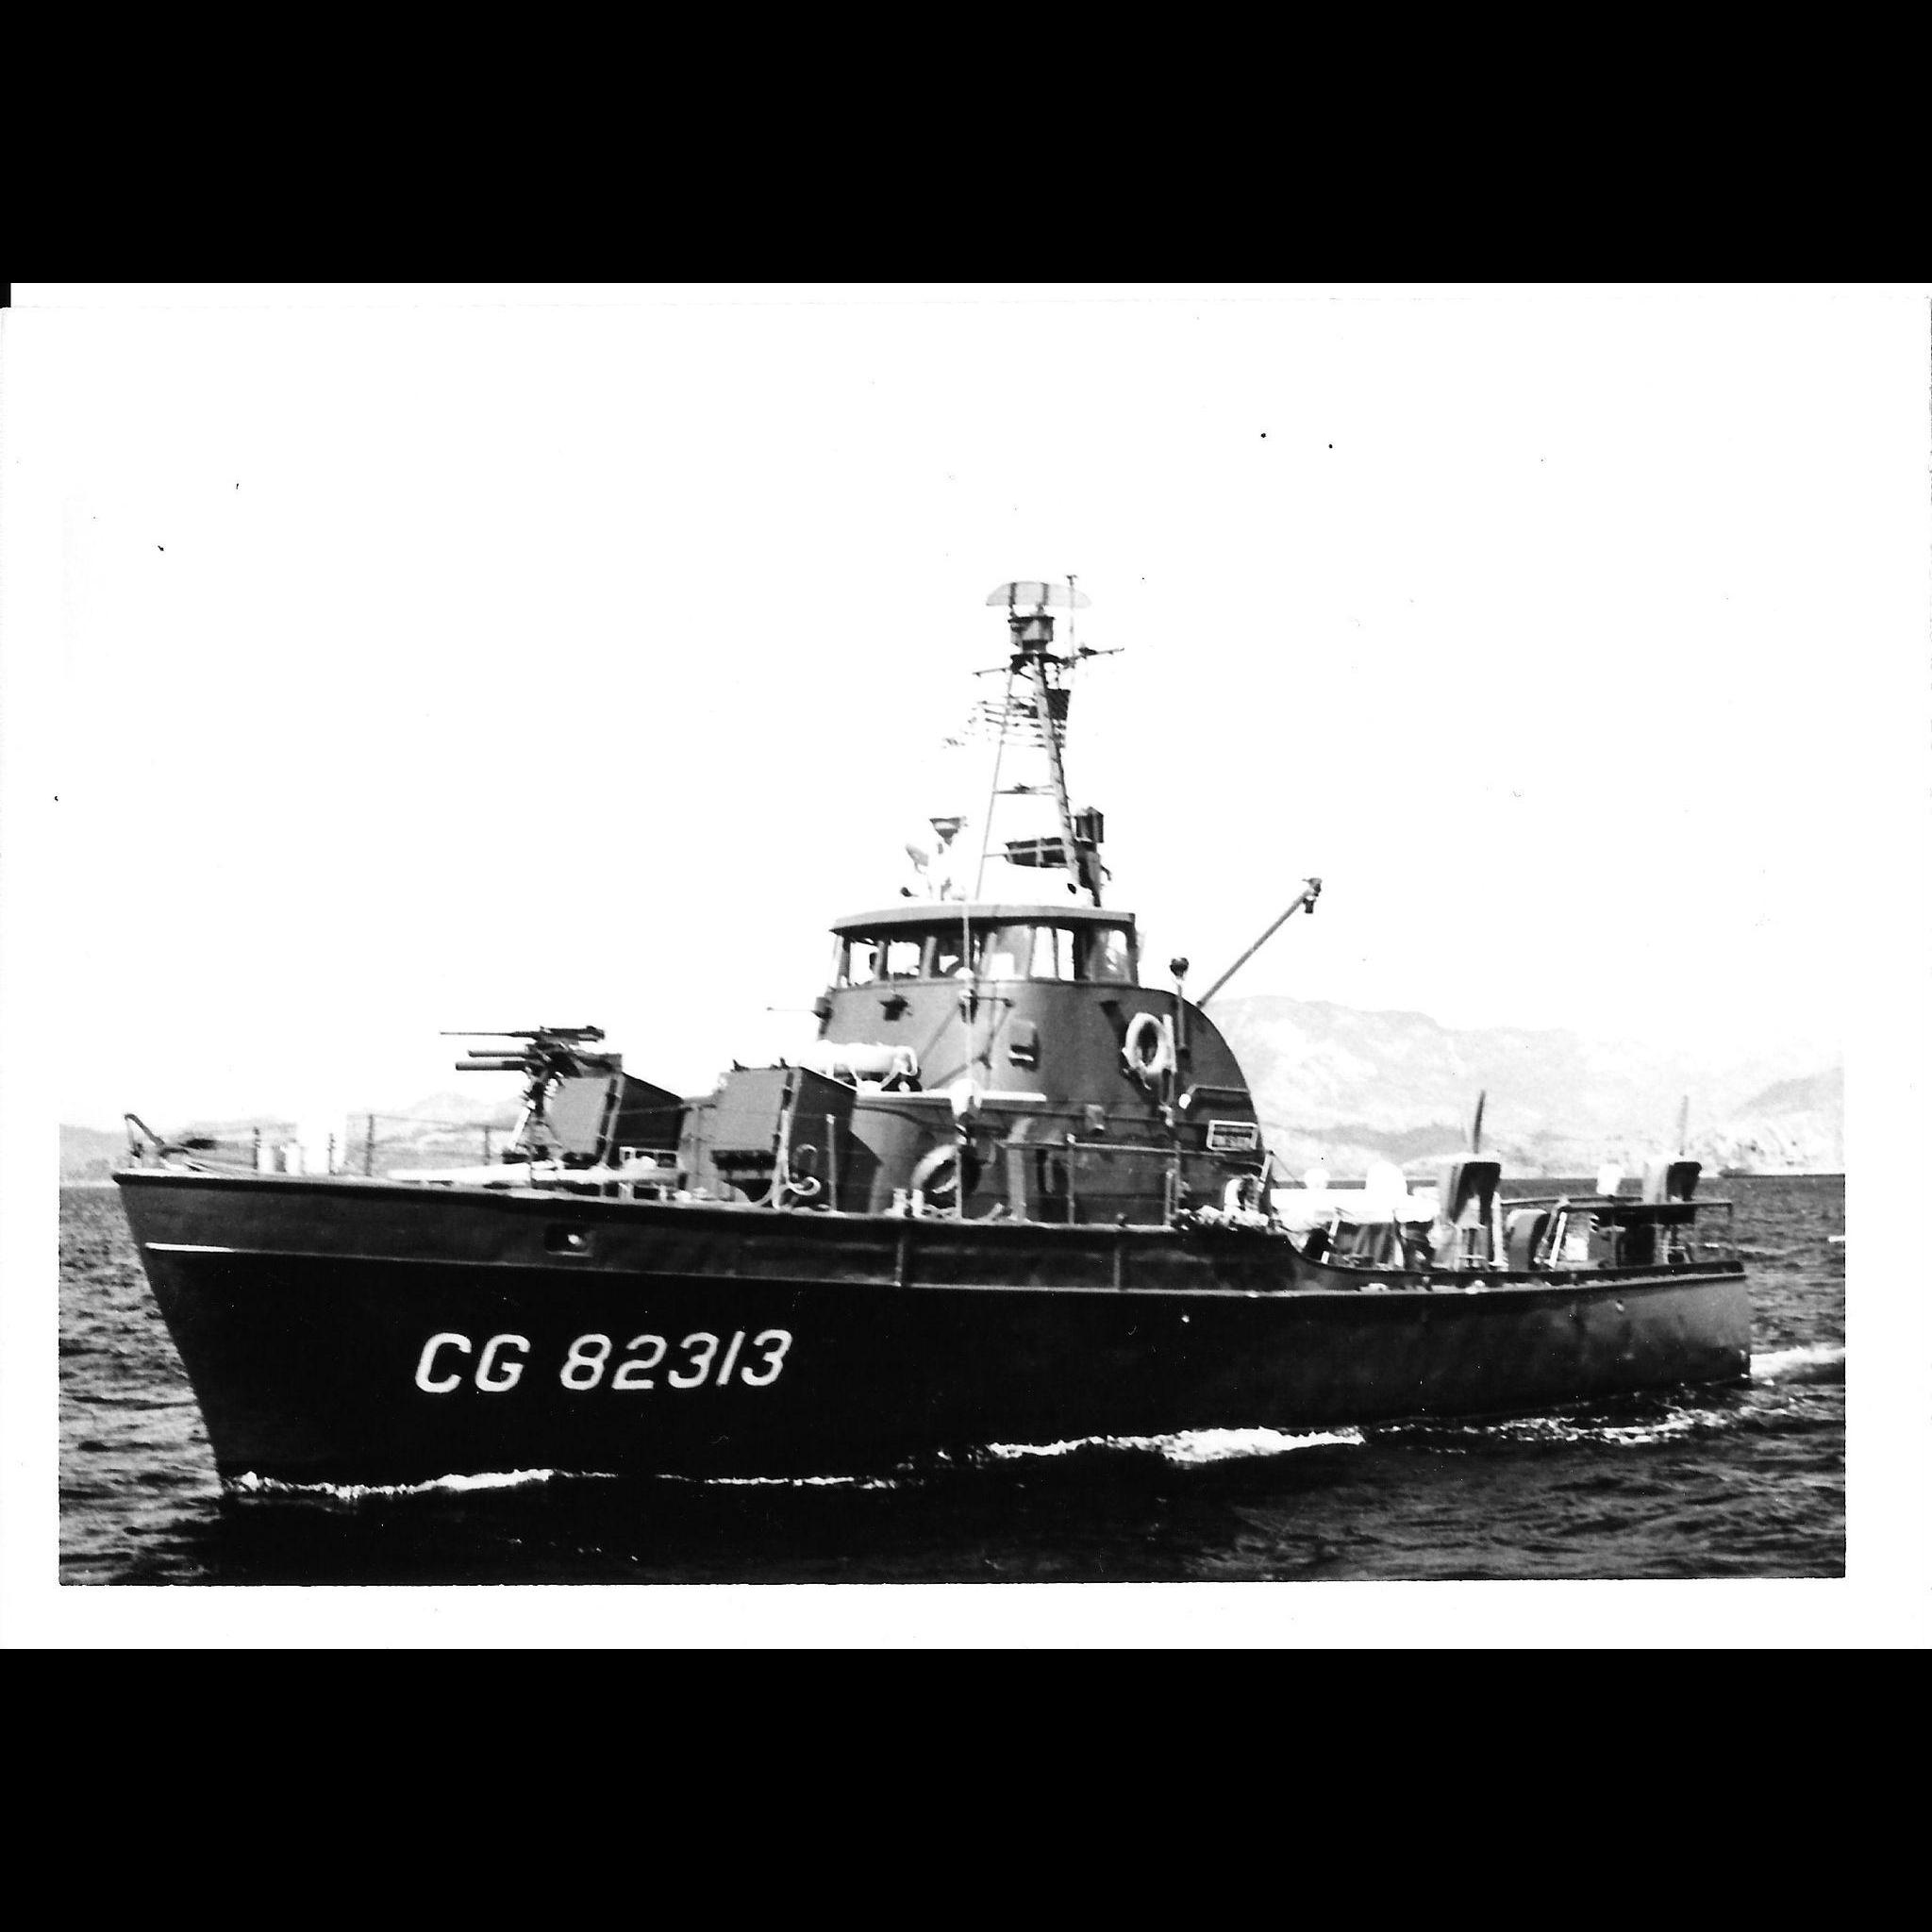 Vintage Photo Brown Water Navy Vietnam War Era CG Cutter Original Photograph